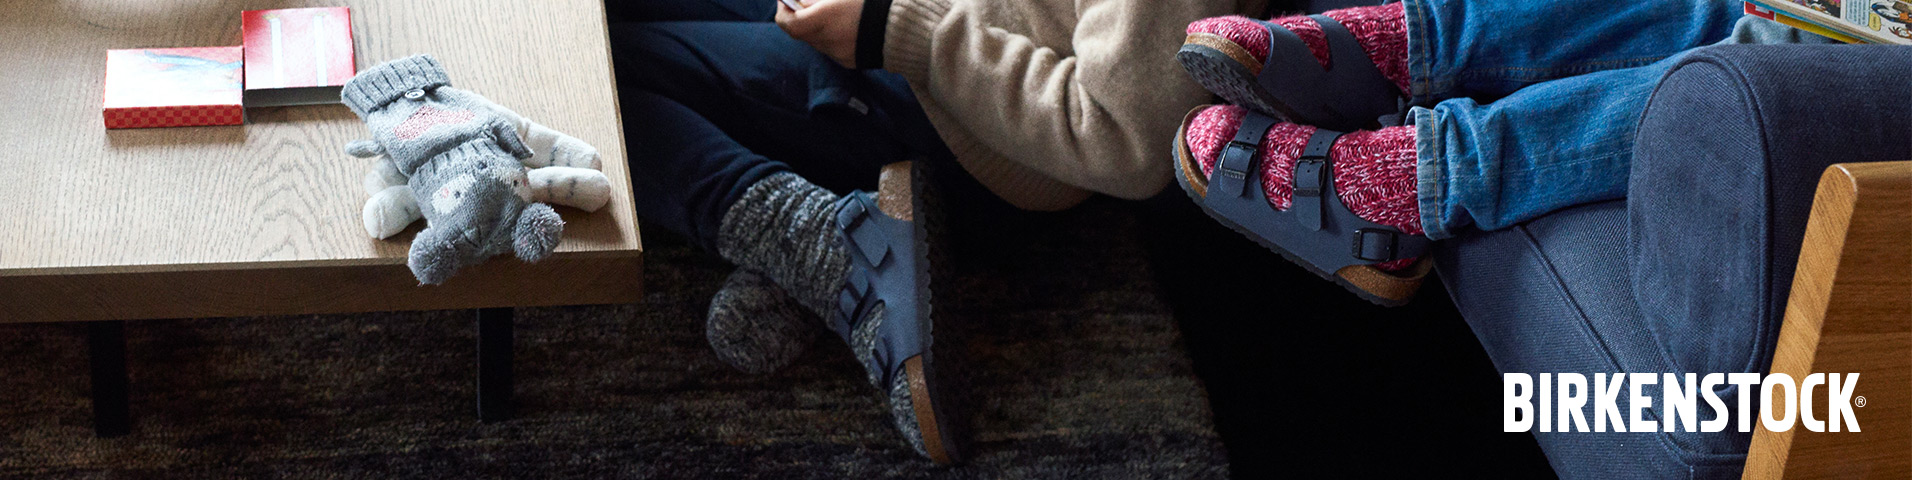 Birkenstock Kinderschuhe online shoppen | Zalando